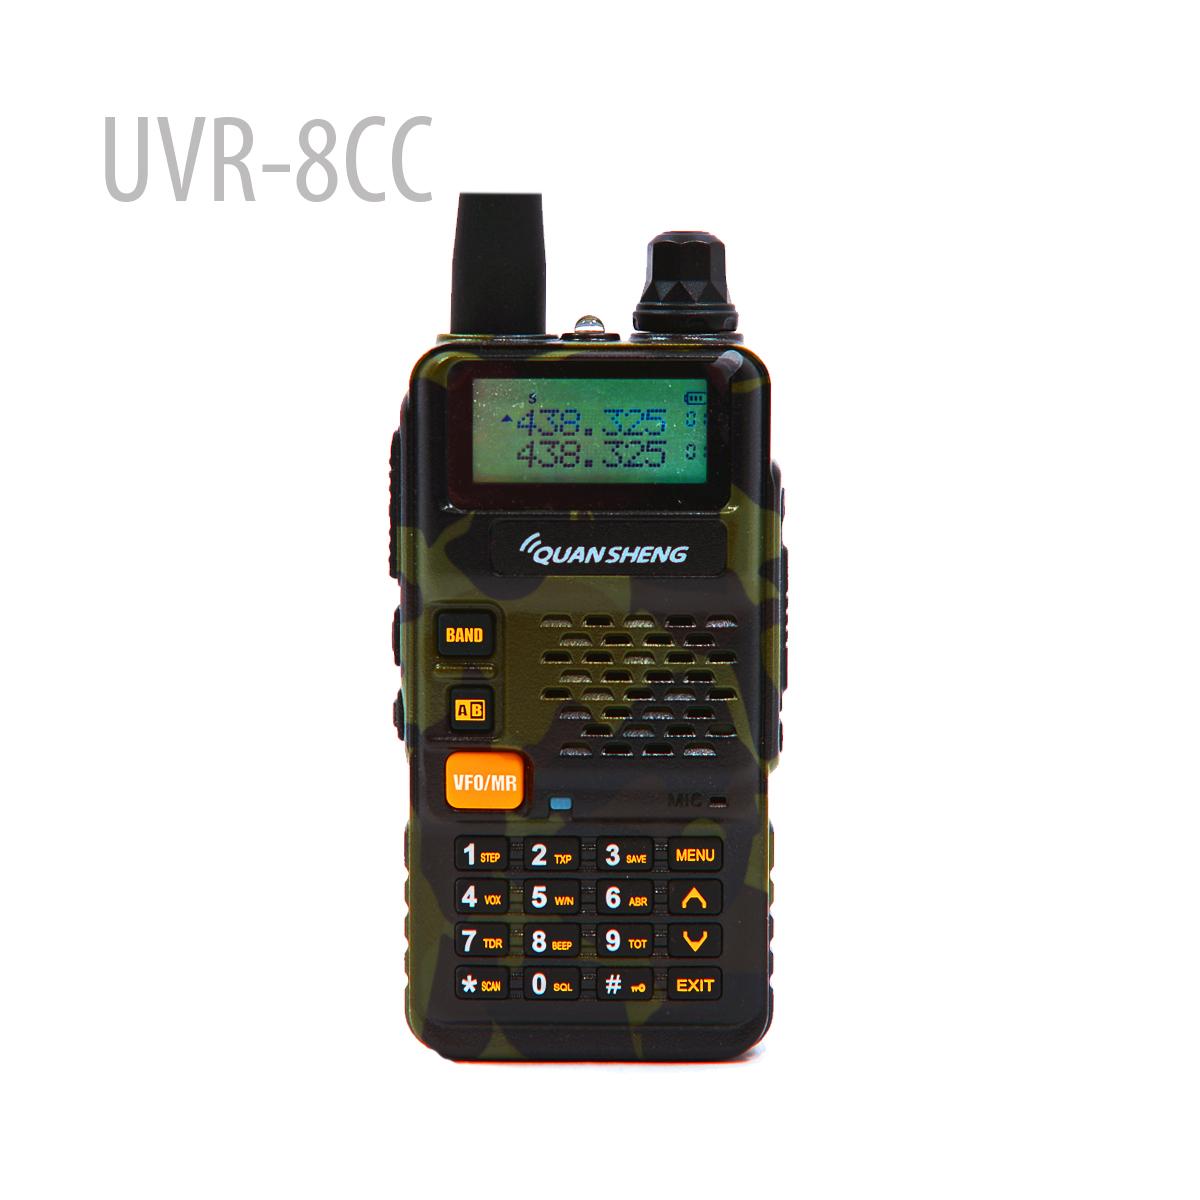 QUANSHENG UVR8-CC Duel Band Radio UV136~174400-480MHz